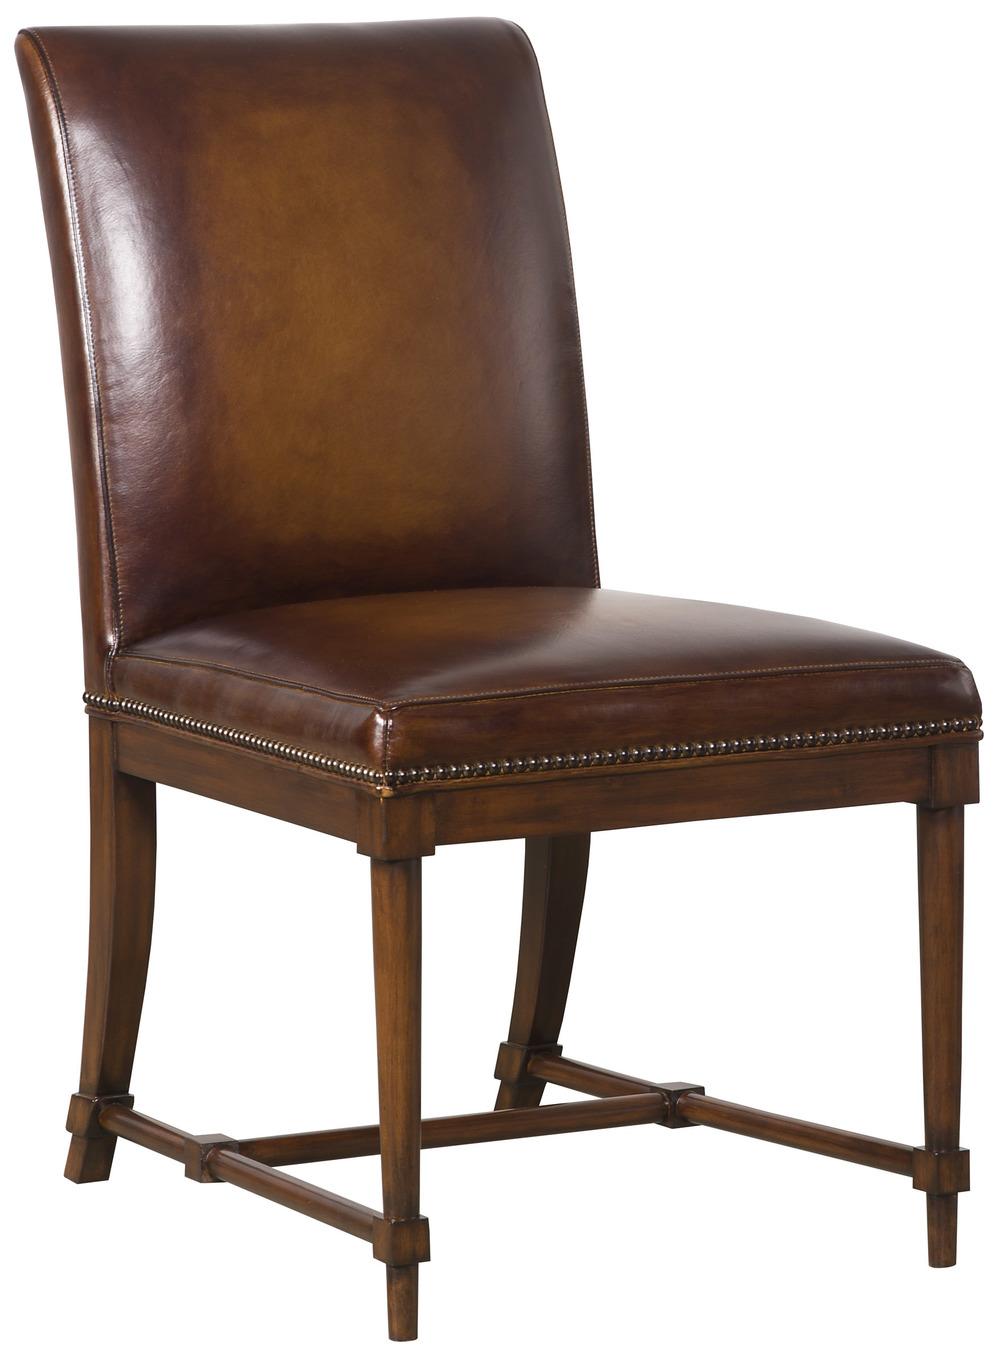 Vanguard Furniture - Chronos Side Chair